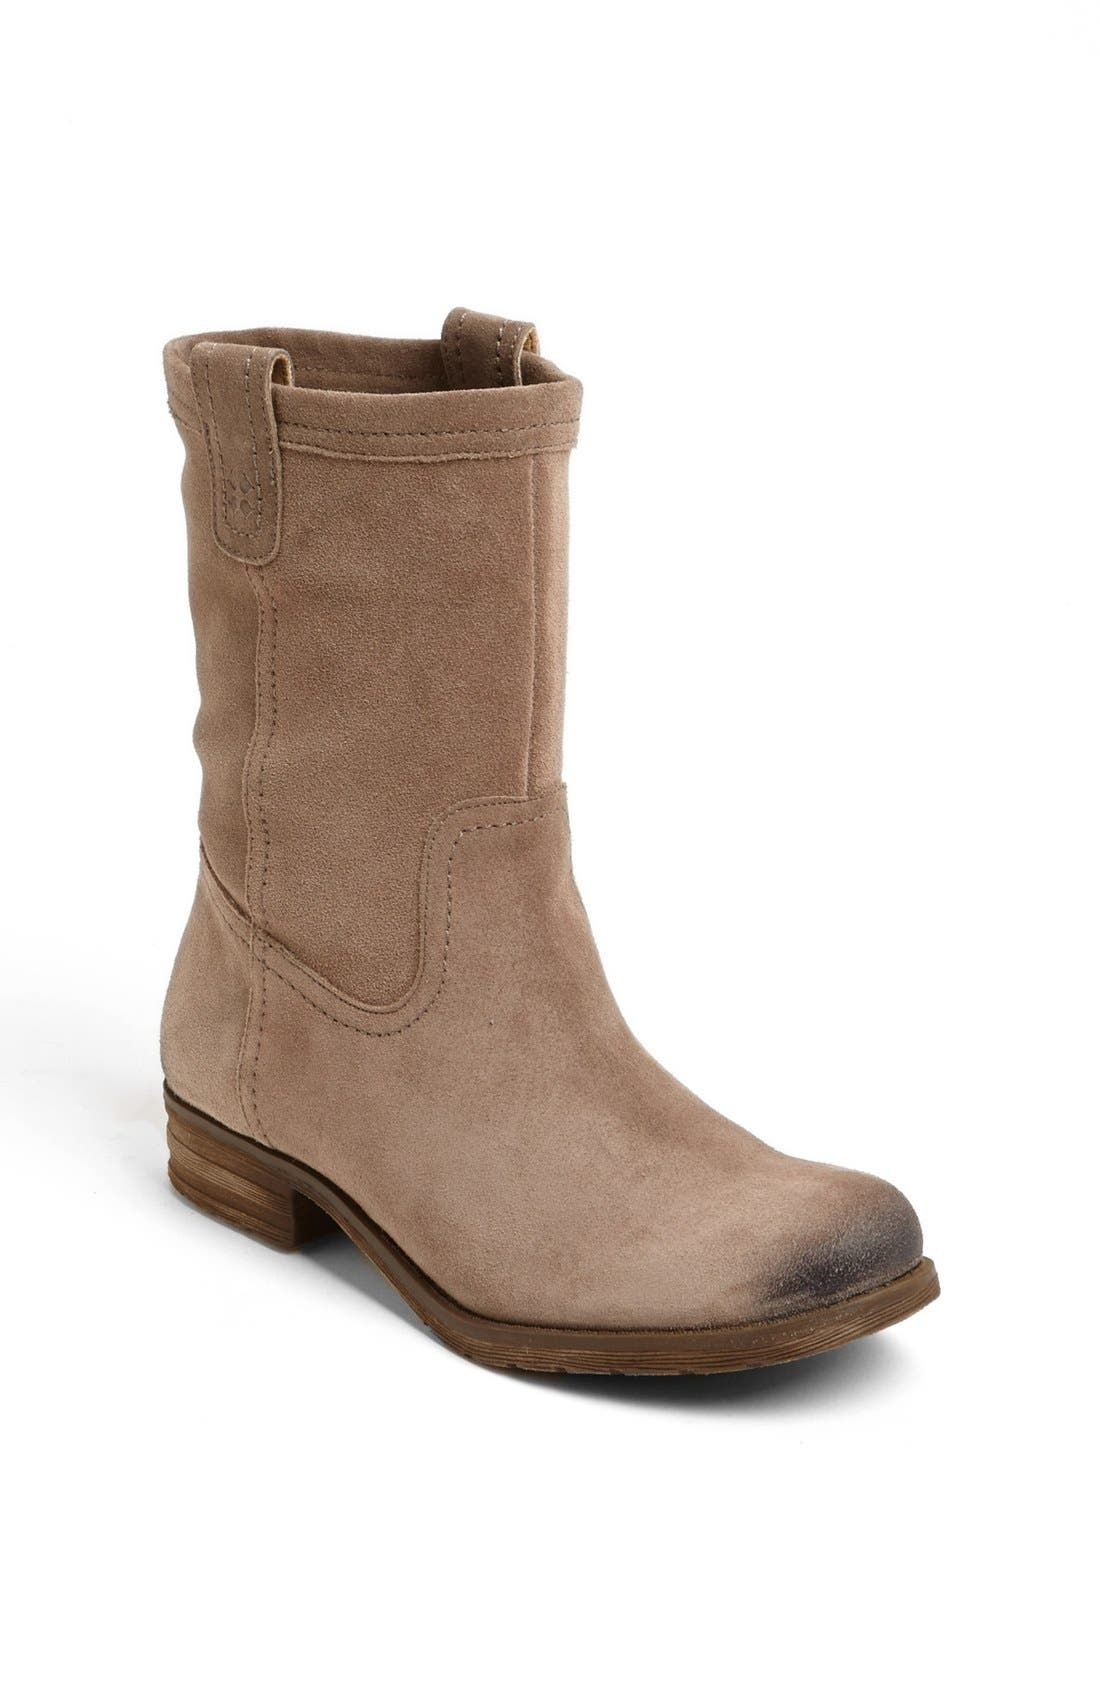 Alternate Image 1 Selected - Naturalizer 'Basha' Boot